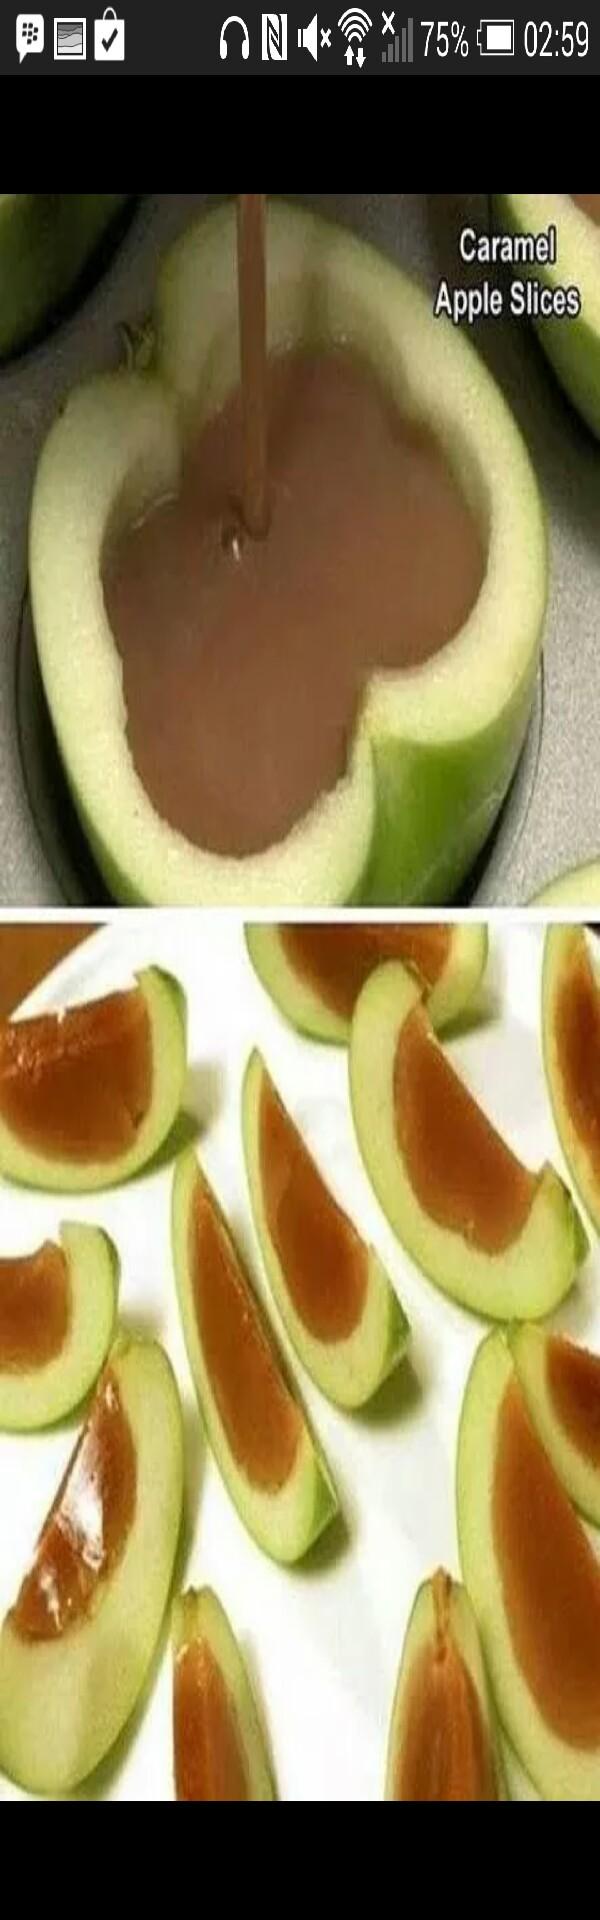 How to make caramel apple slices 💕